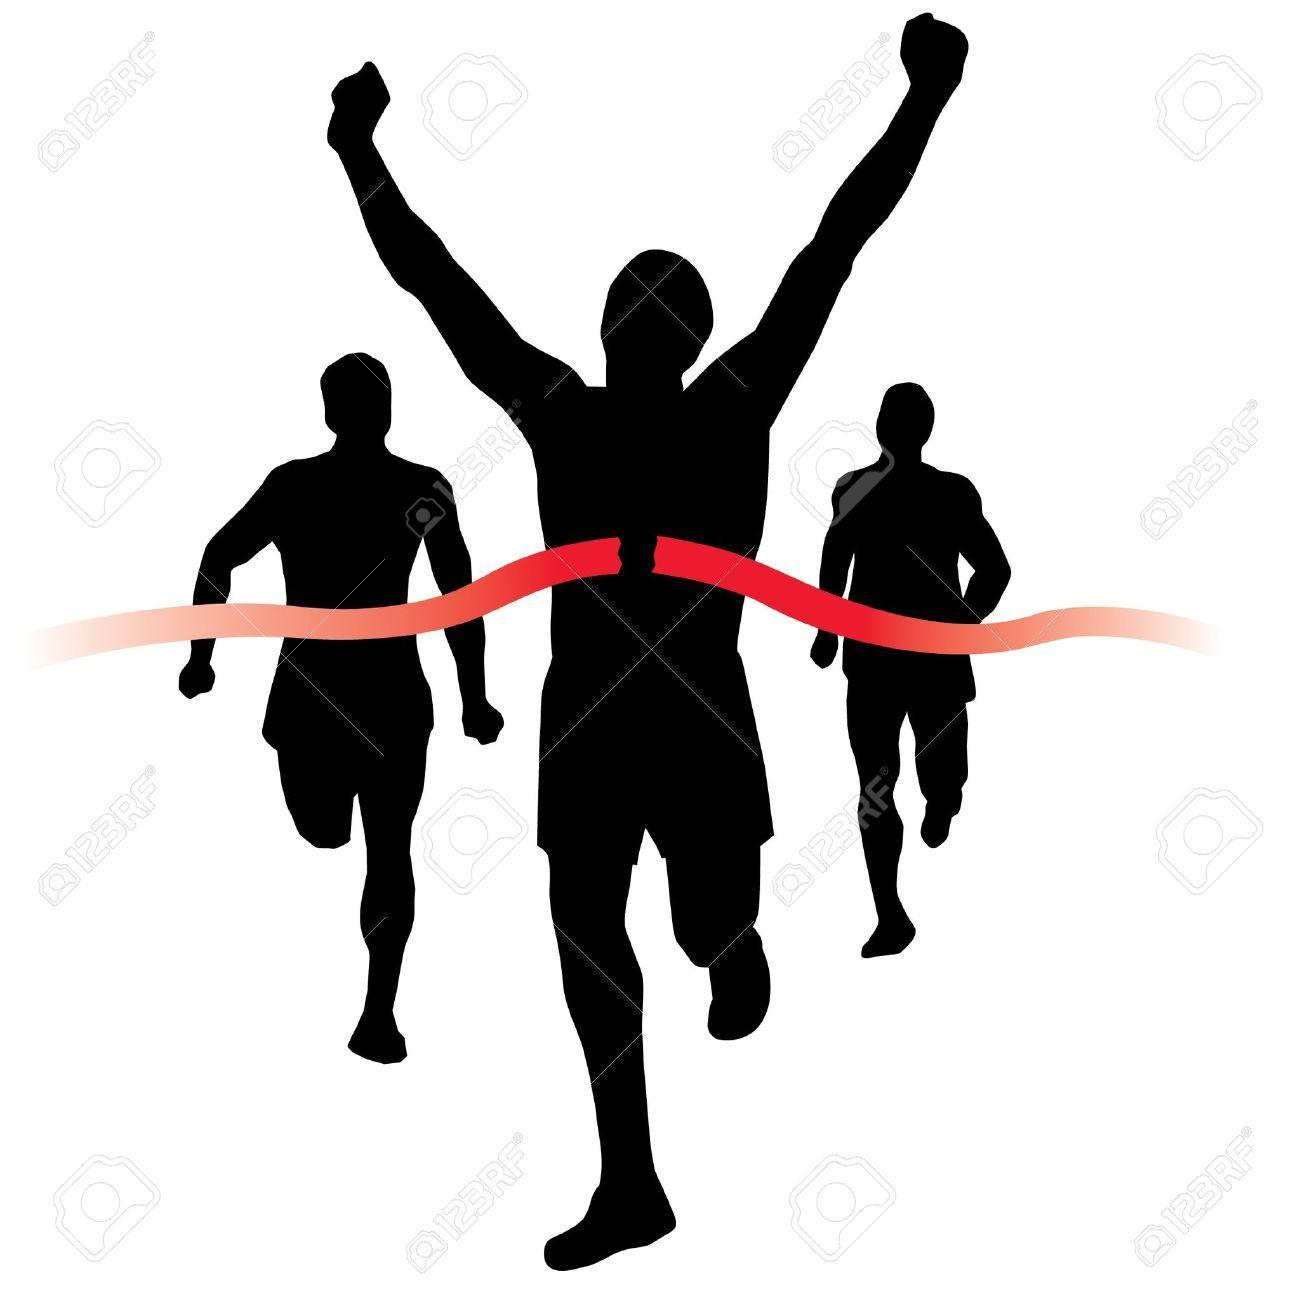 Runner crossing finish line clipart transparent Runner crossing finish line clipart » Clipart Portal transparent